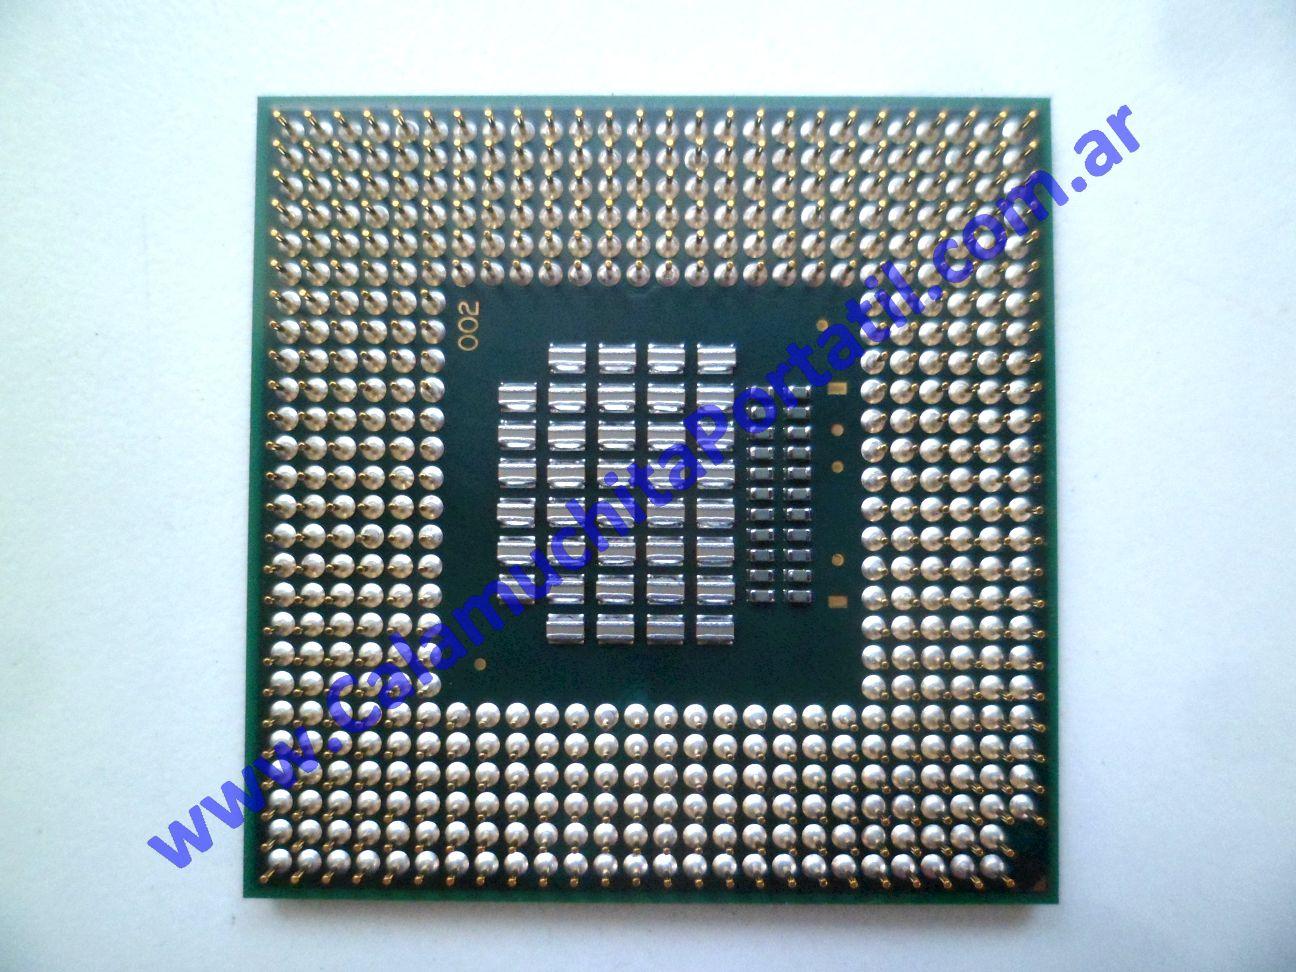 0621QQA Procesador Hewlett Packard Pavillion dv6000 / dv6245us / RP285UA#ABA